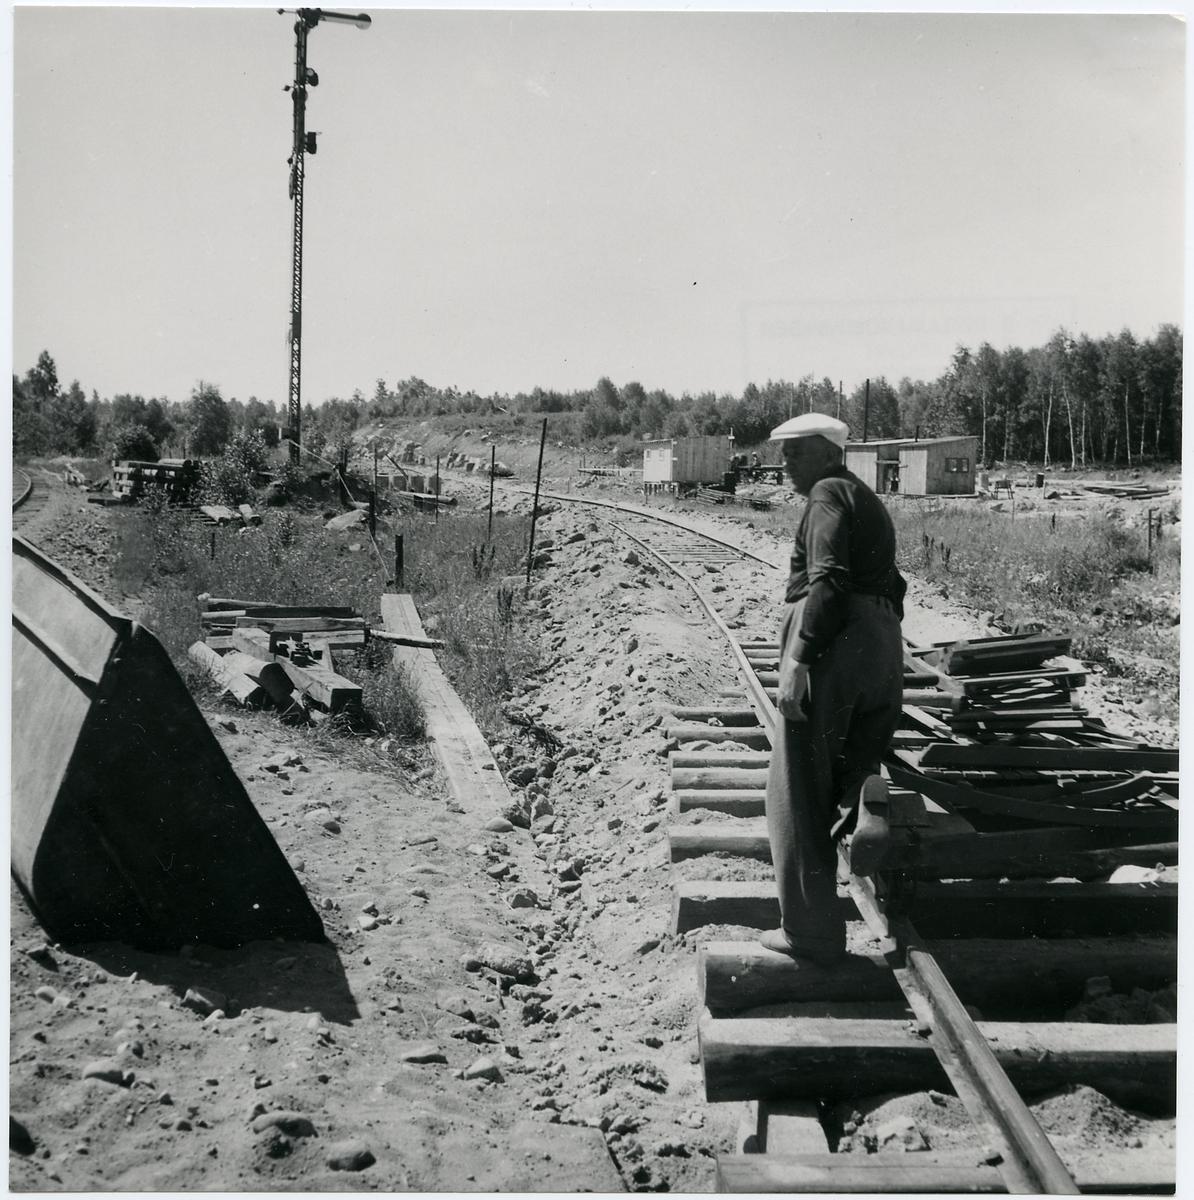 Dubbelspårsbygge på linjen mellan Boxholm och Sommen.